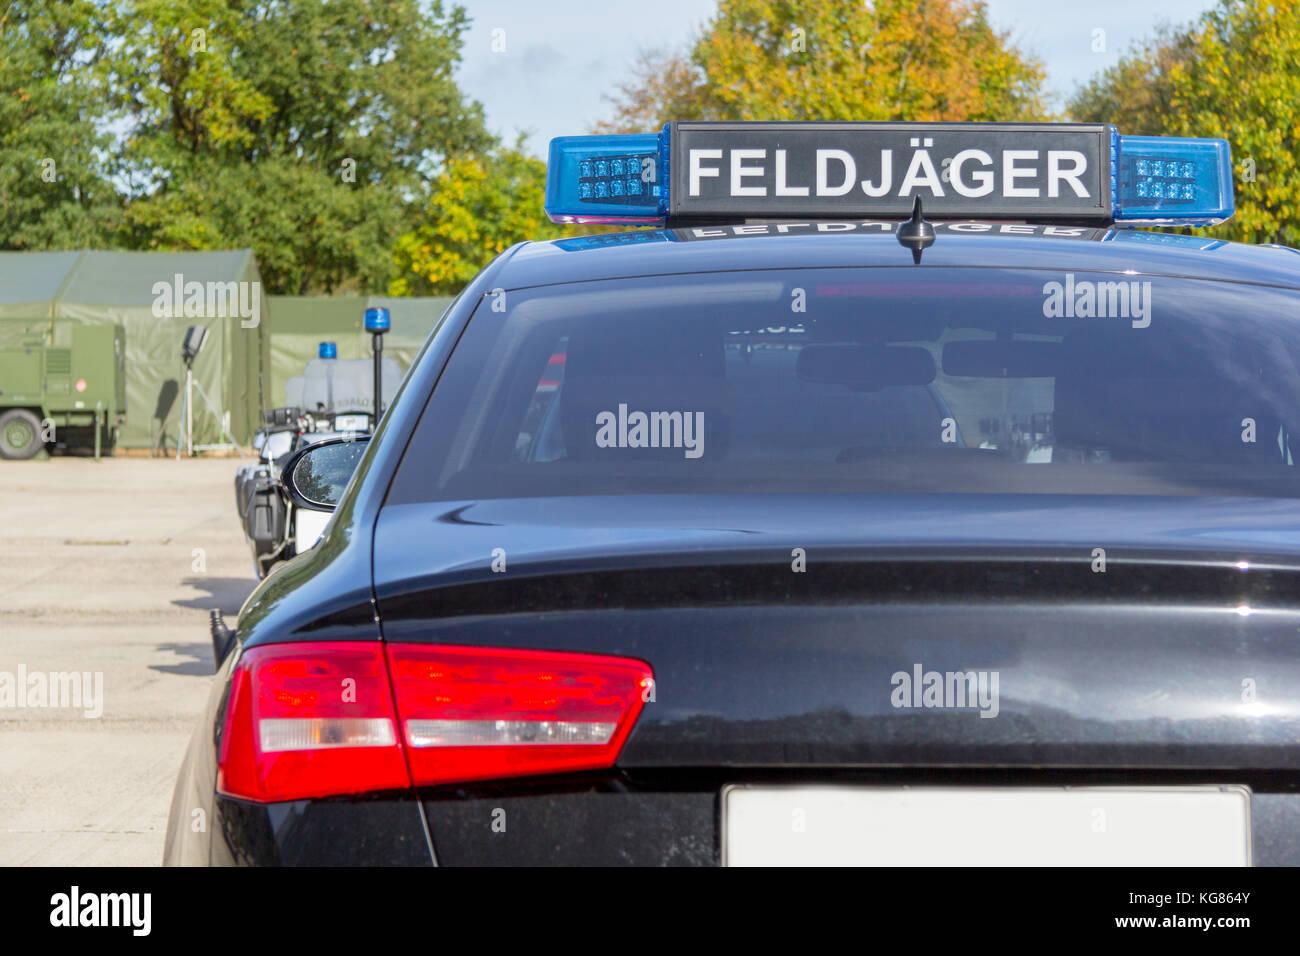 Blue light bar from a civil feldjaeger military police car stock blue light bar from a civil feldjaeger military police car mozeypictures Image collections